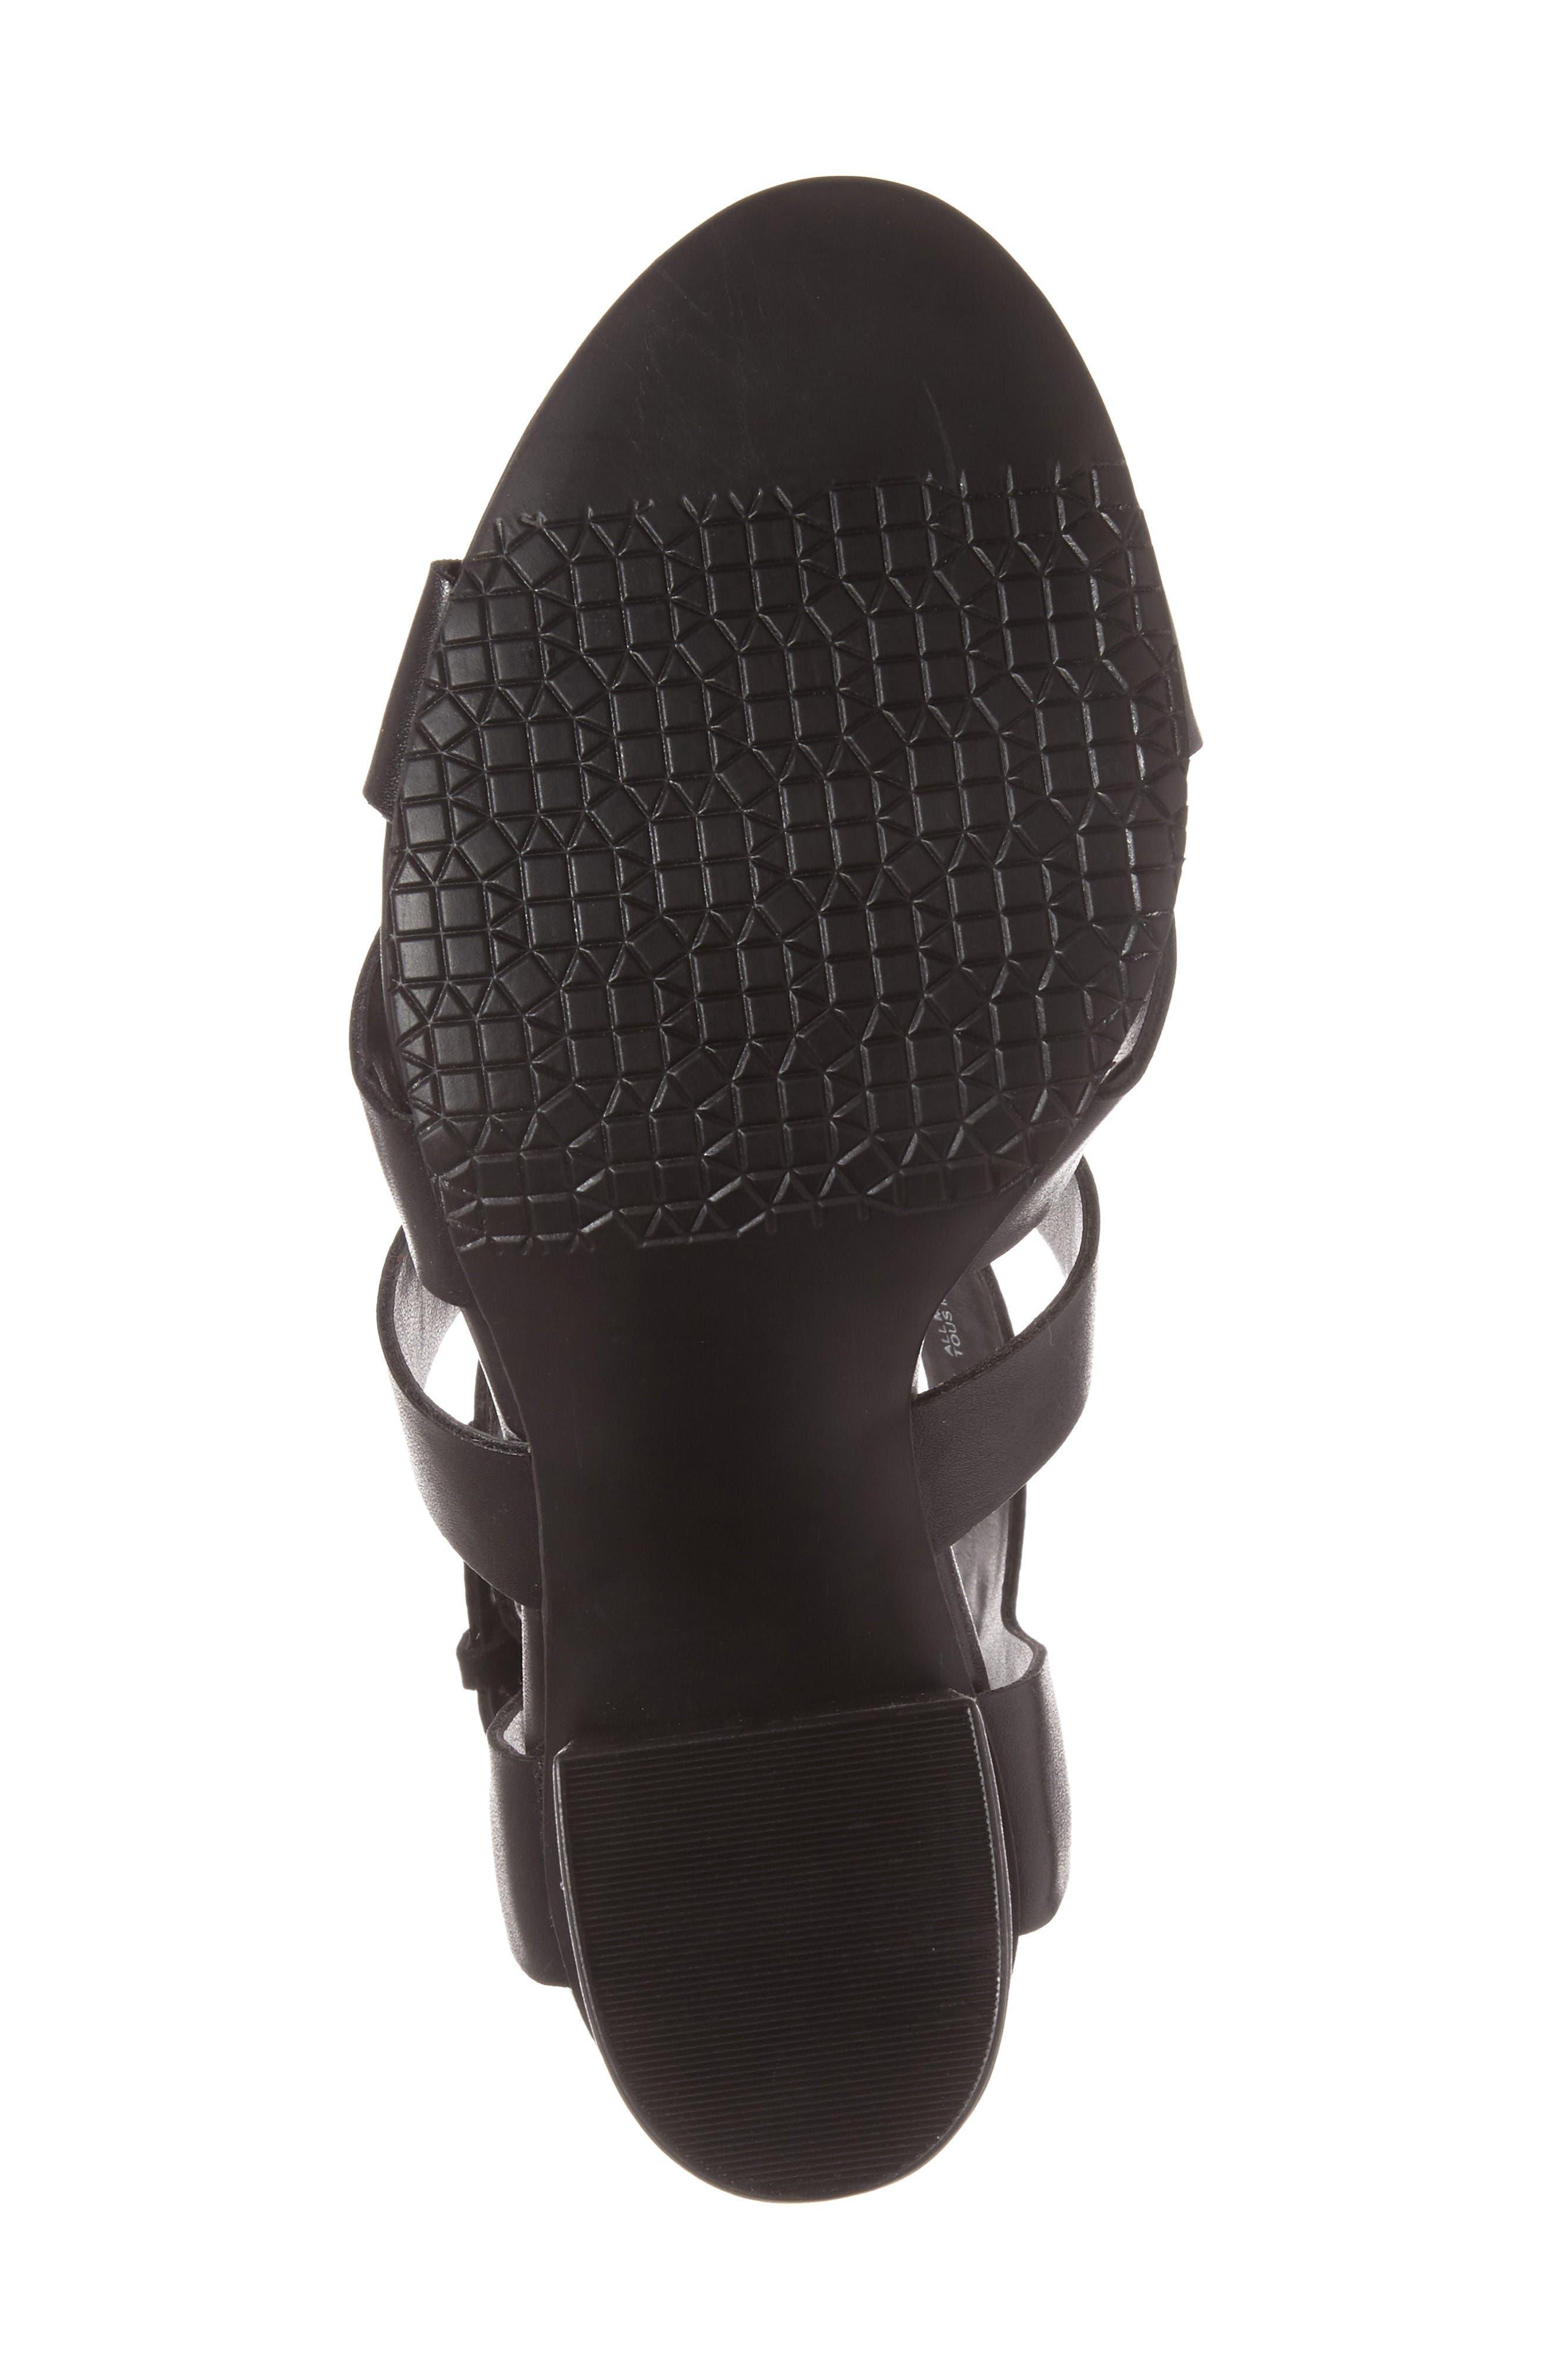 Terry Block Heel Sandal,                             Alternate thumbnail 4, color,                             Black Faux Leather